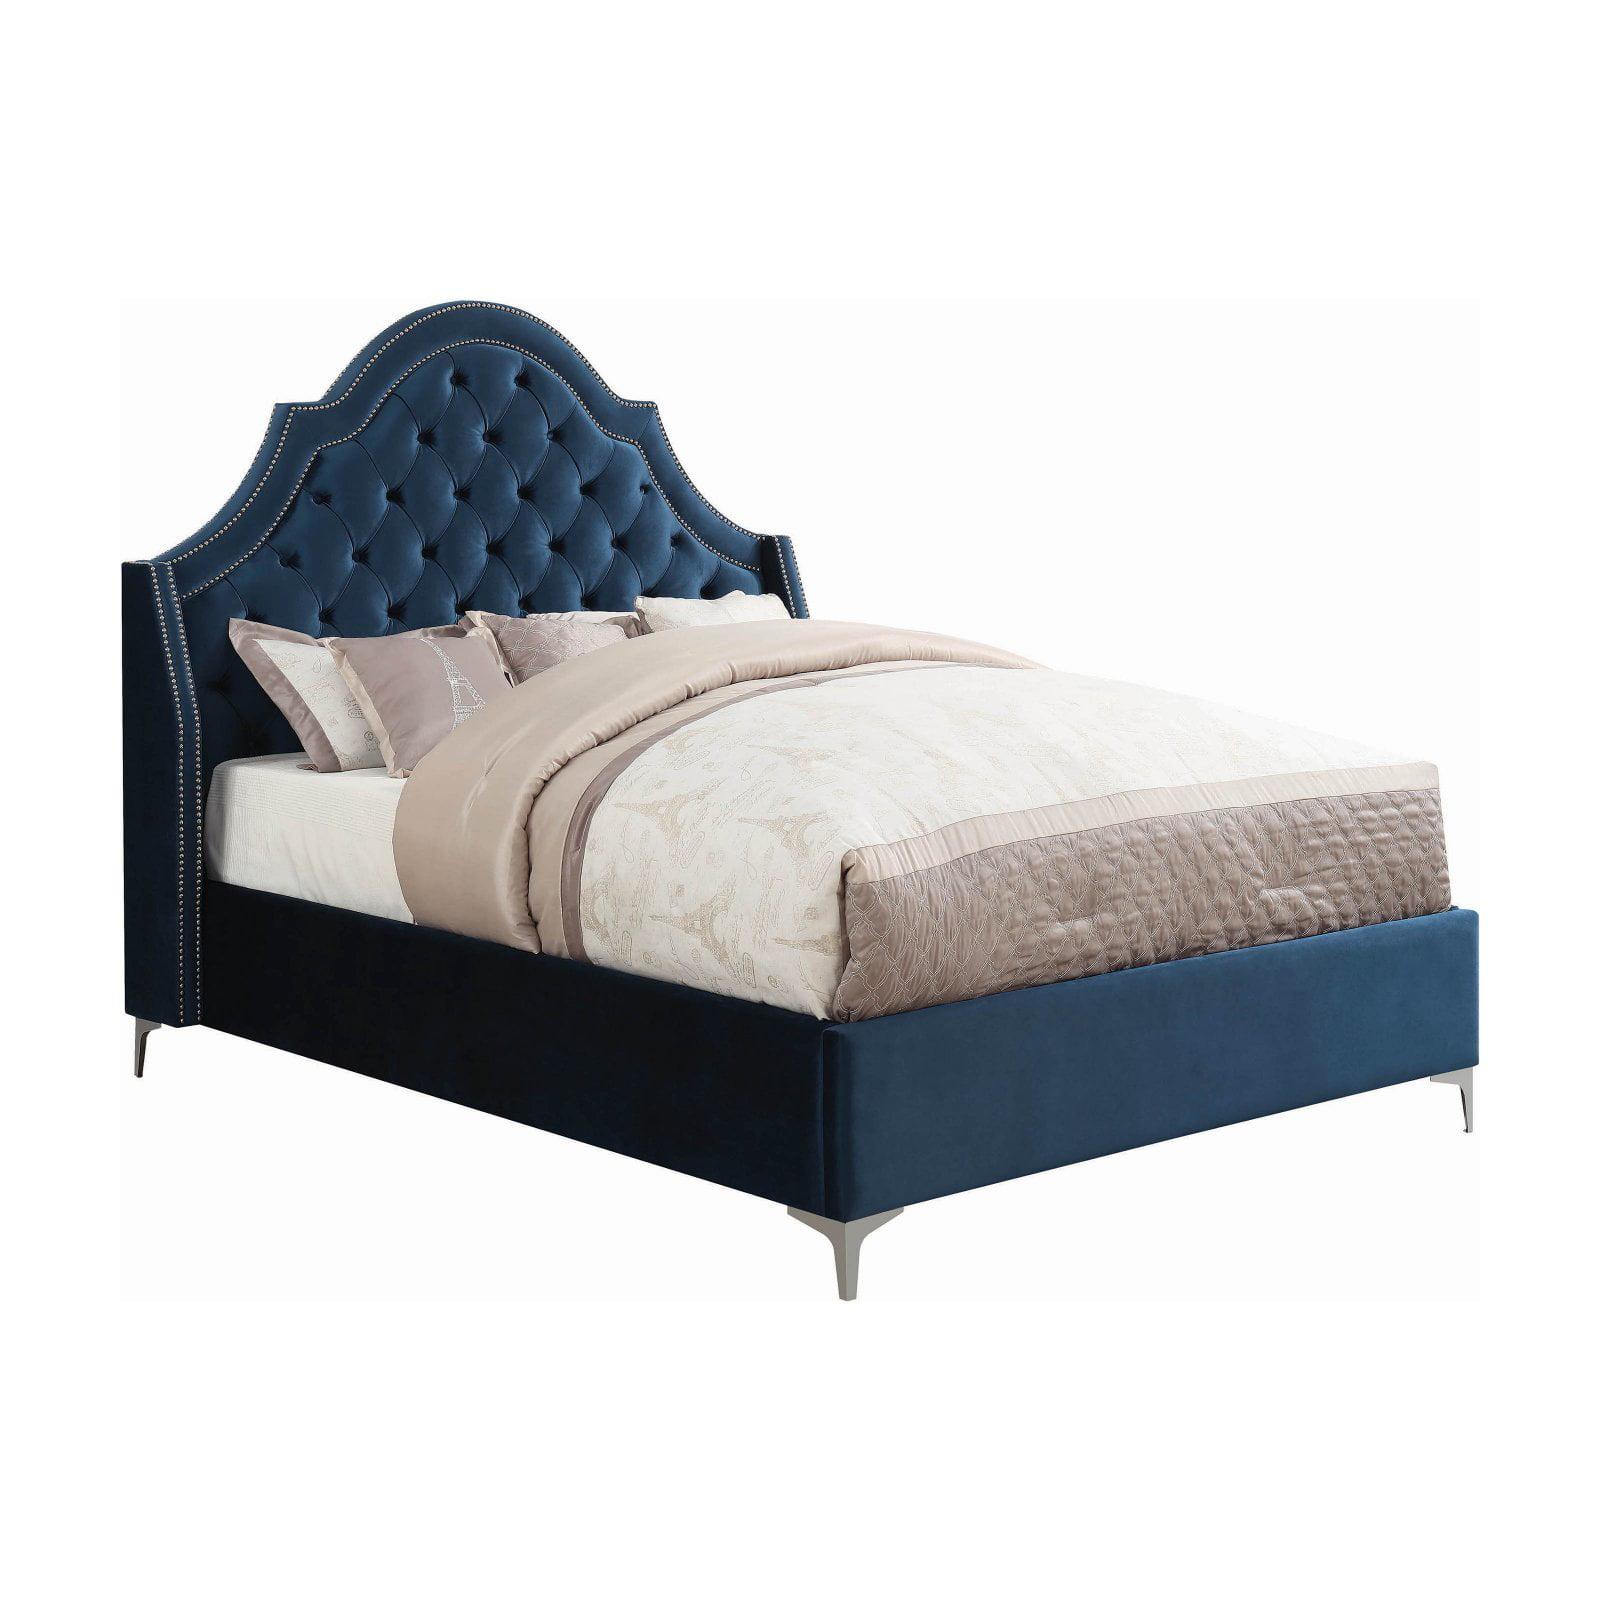 Coaster Furniture Shayne Upholstered Low Profile Bed